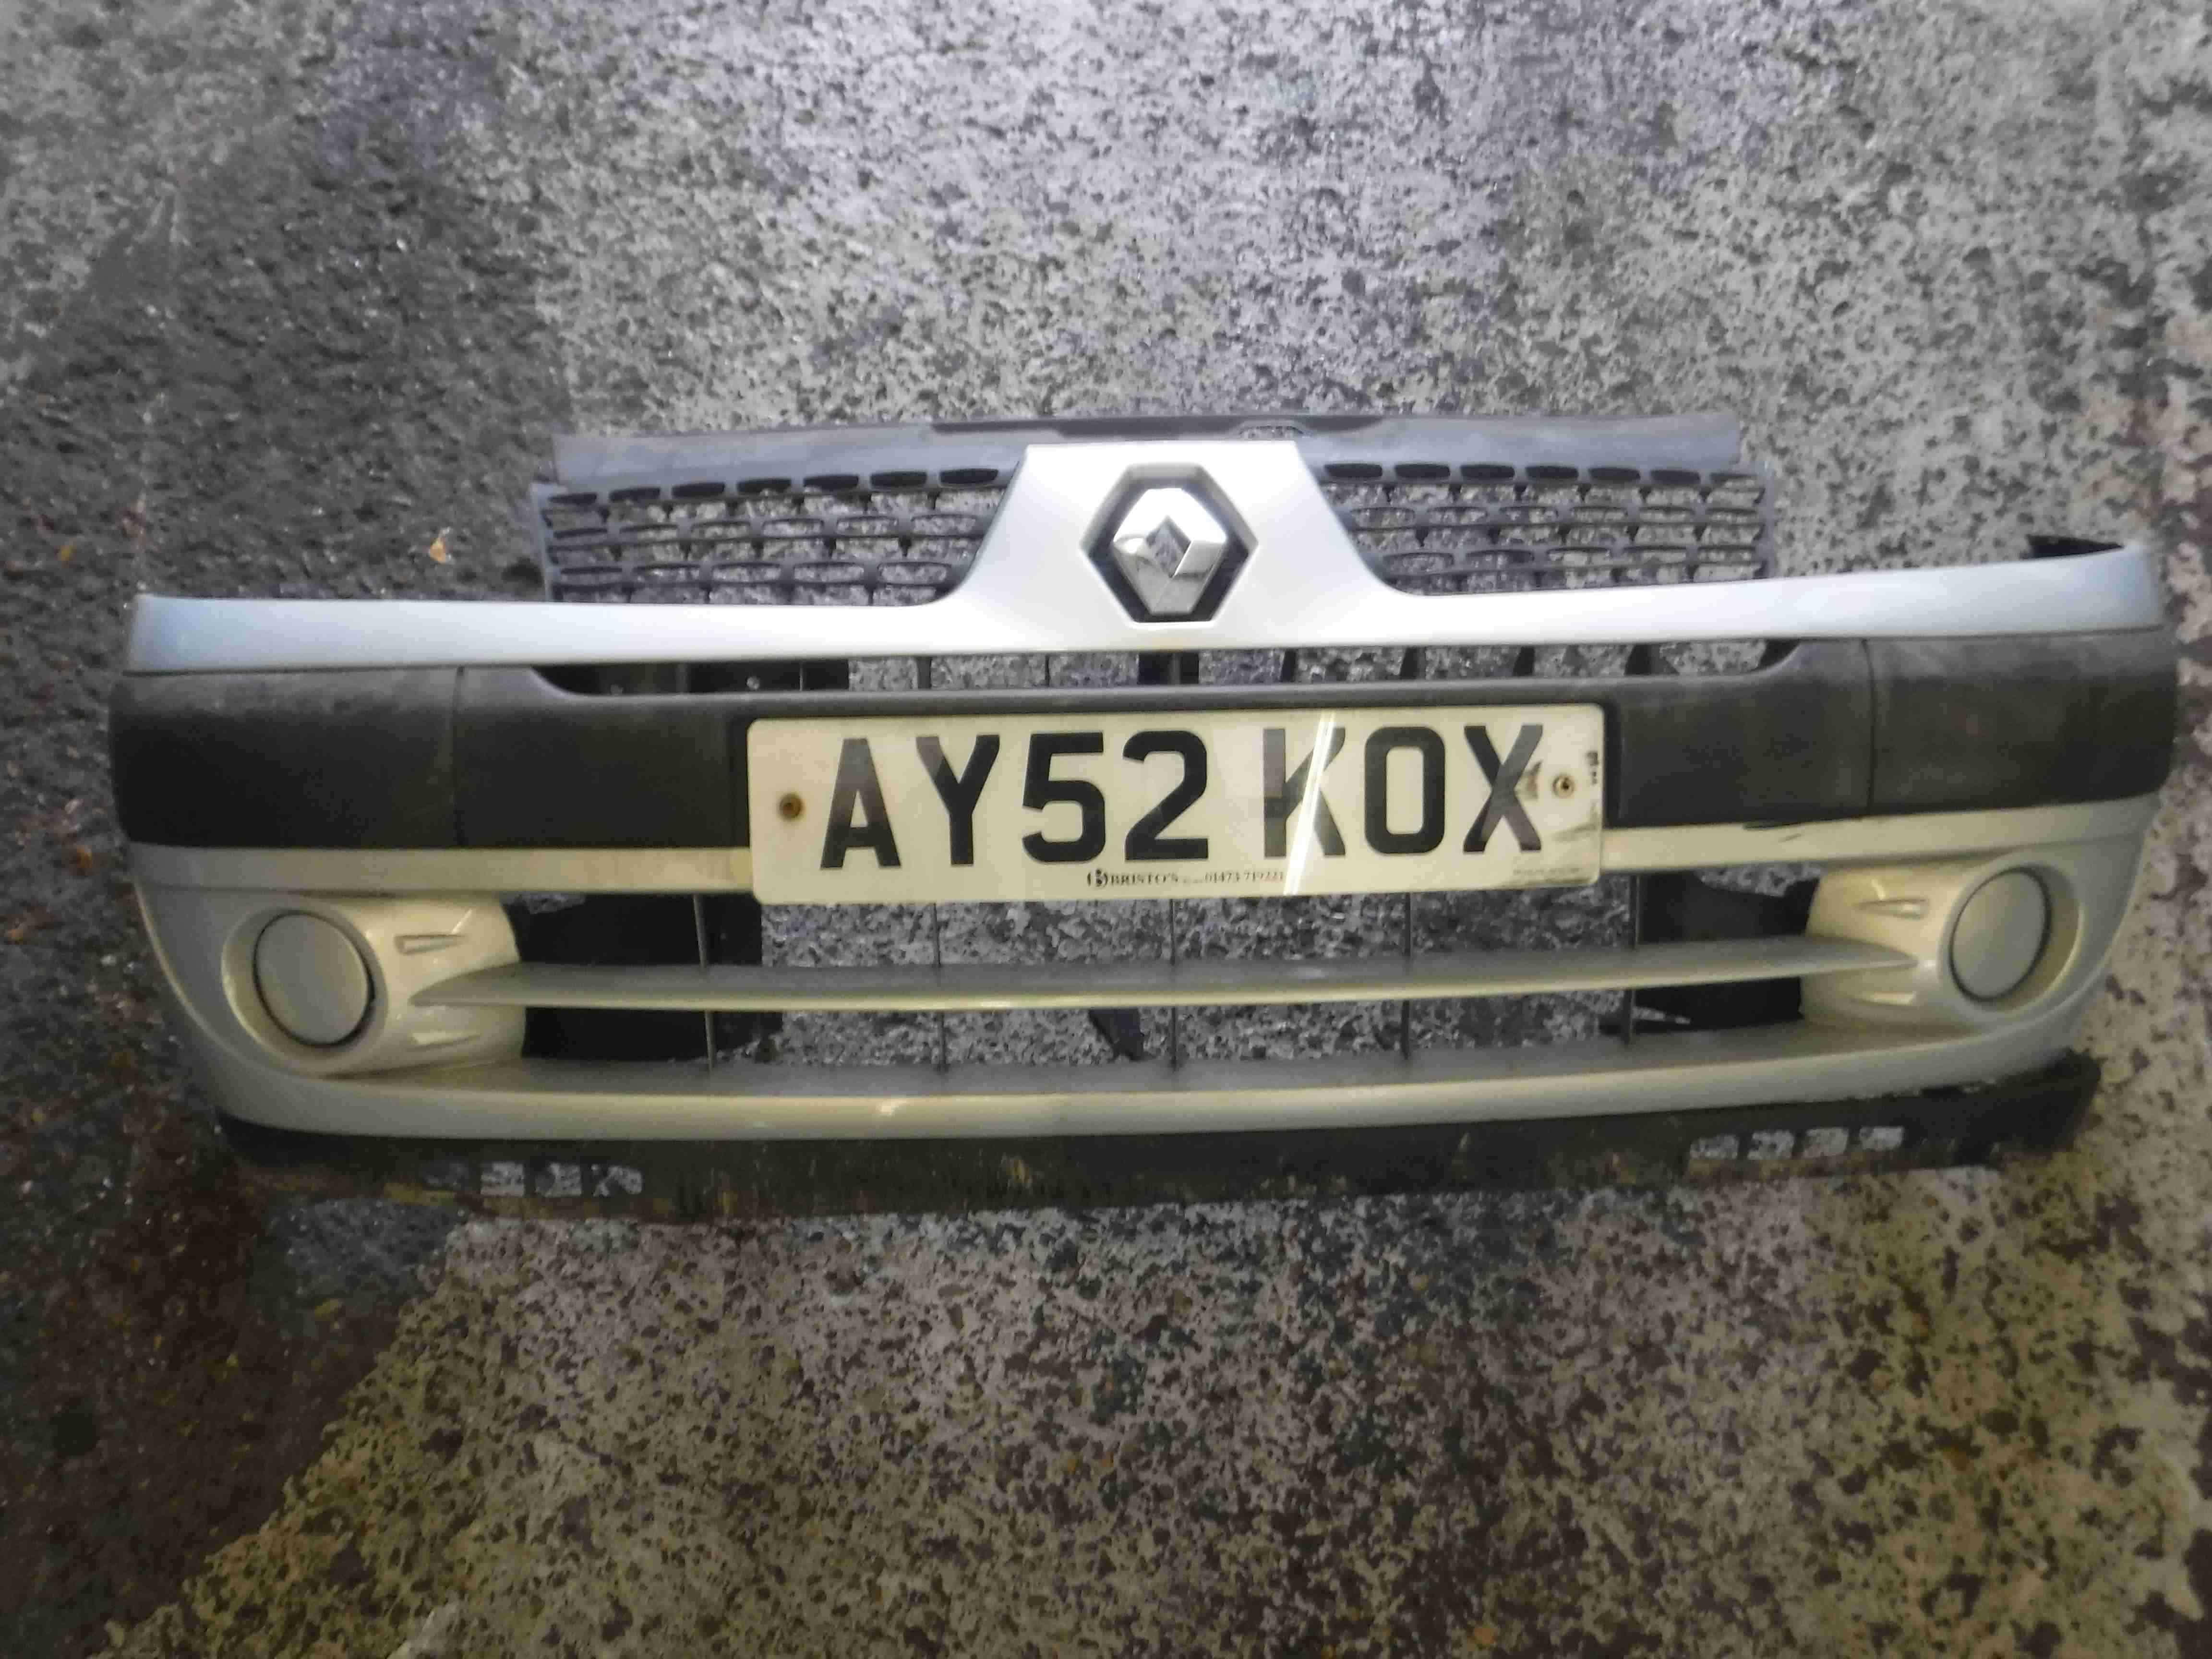 Renault Clio MK2 2001-2006 Front Bumper Silver 632